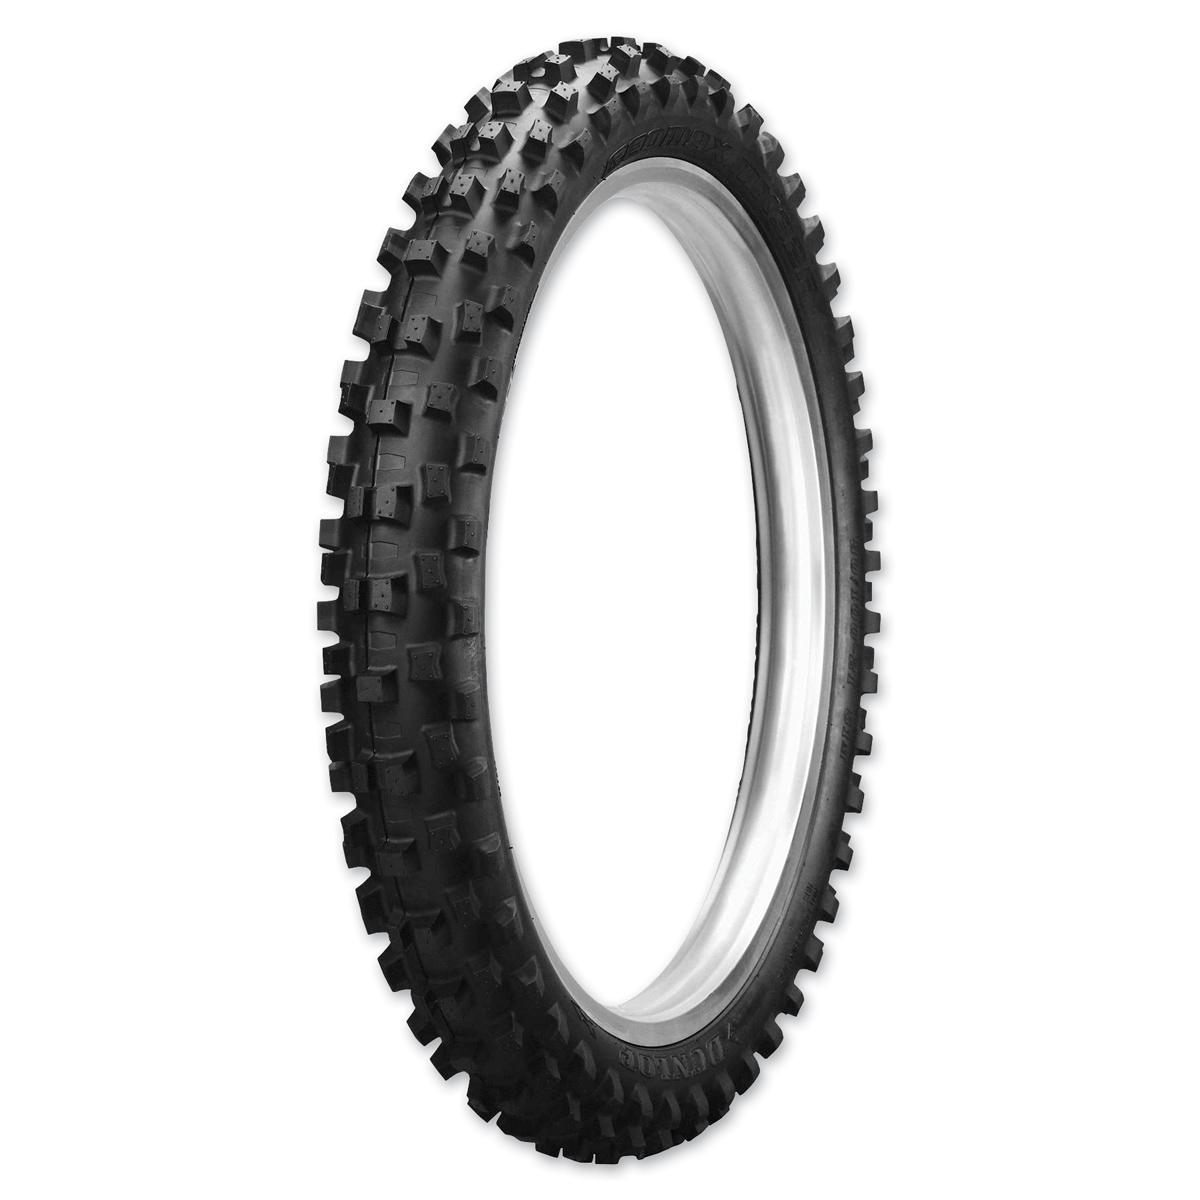 Dunlop MX3S/32 70/100-19 S/T-I/T Front Tire